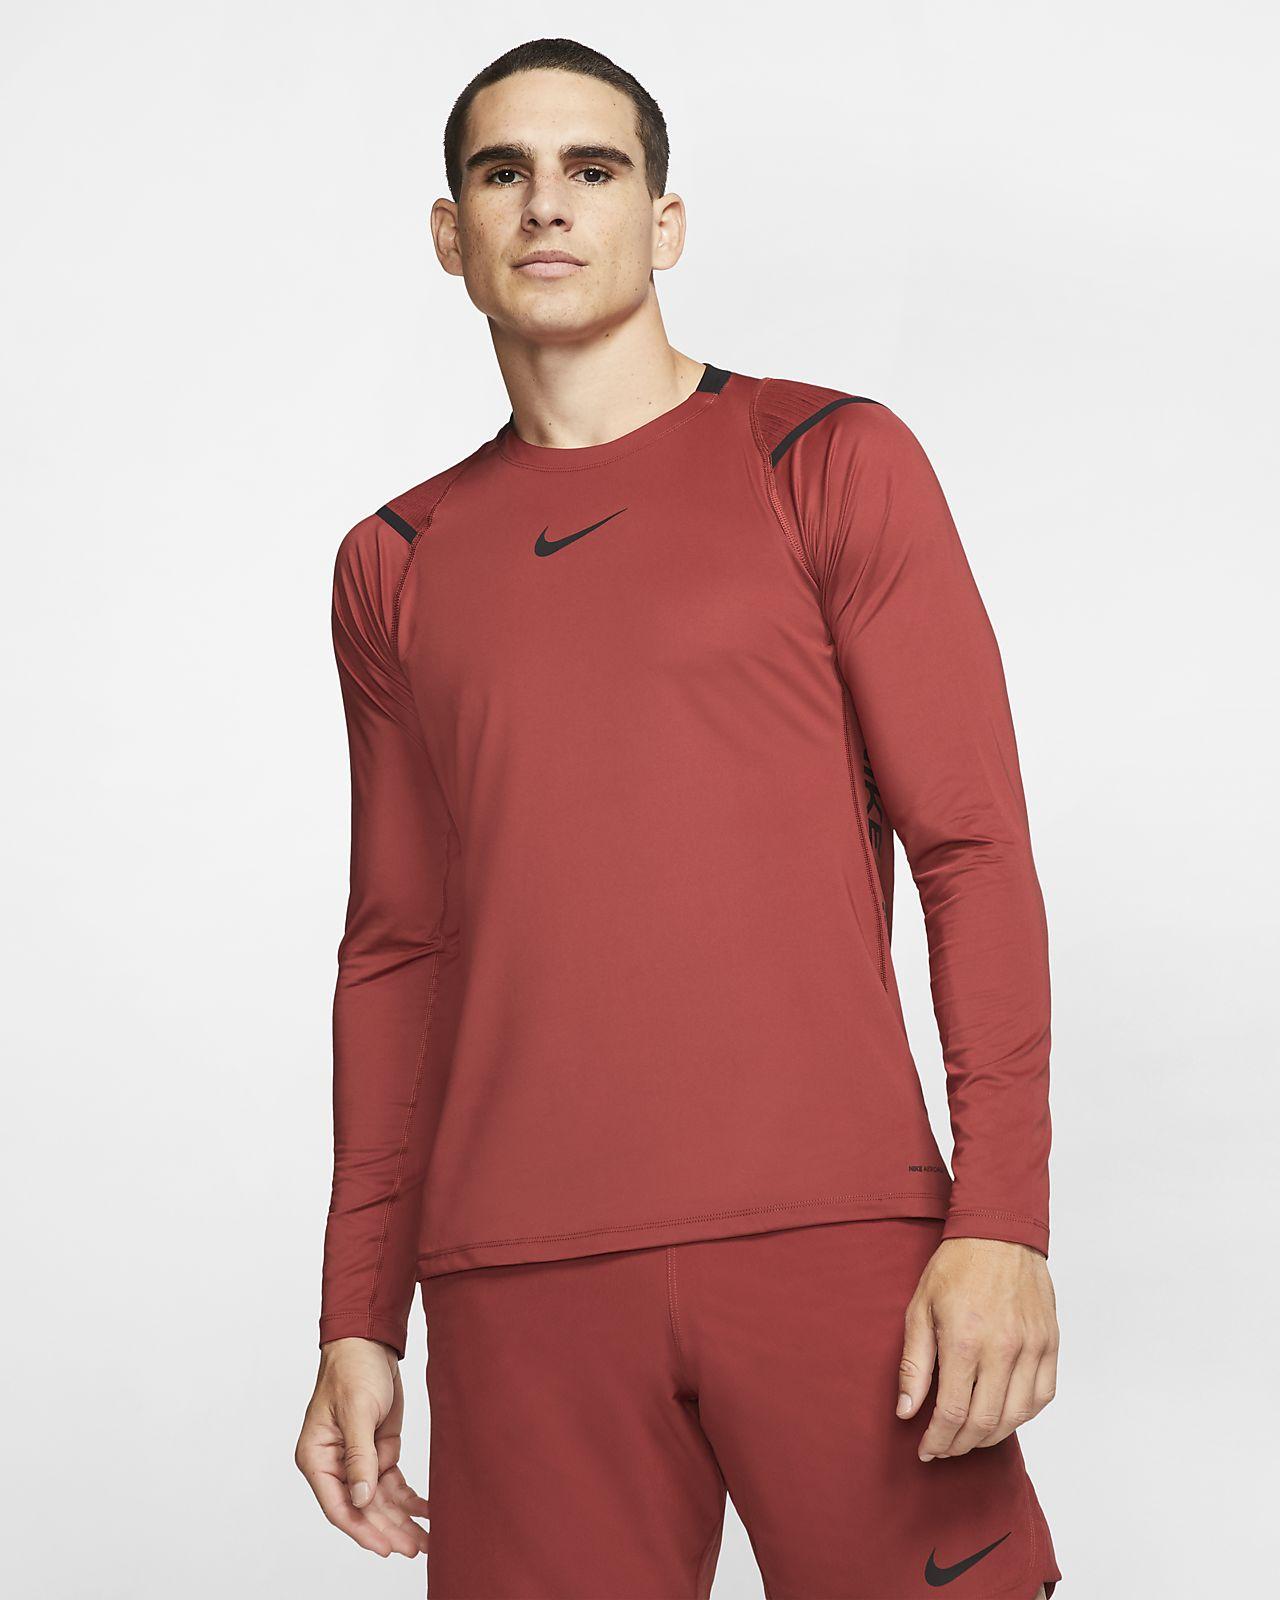 Prenda para la parte superior de manga larga para hombre Nike Pro AeroAdapt